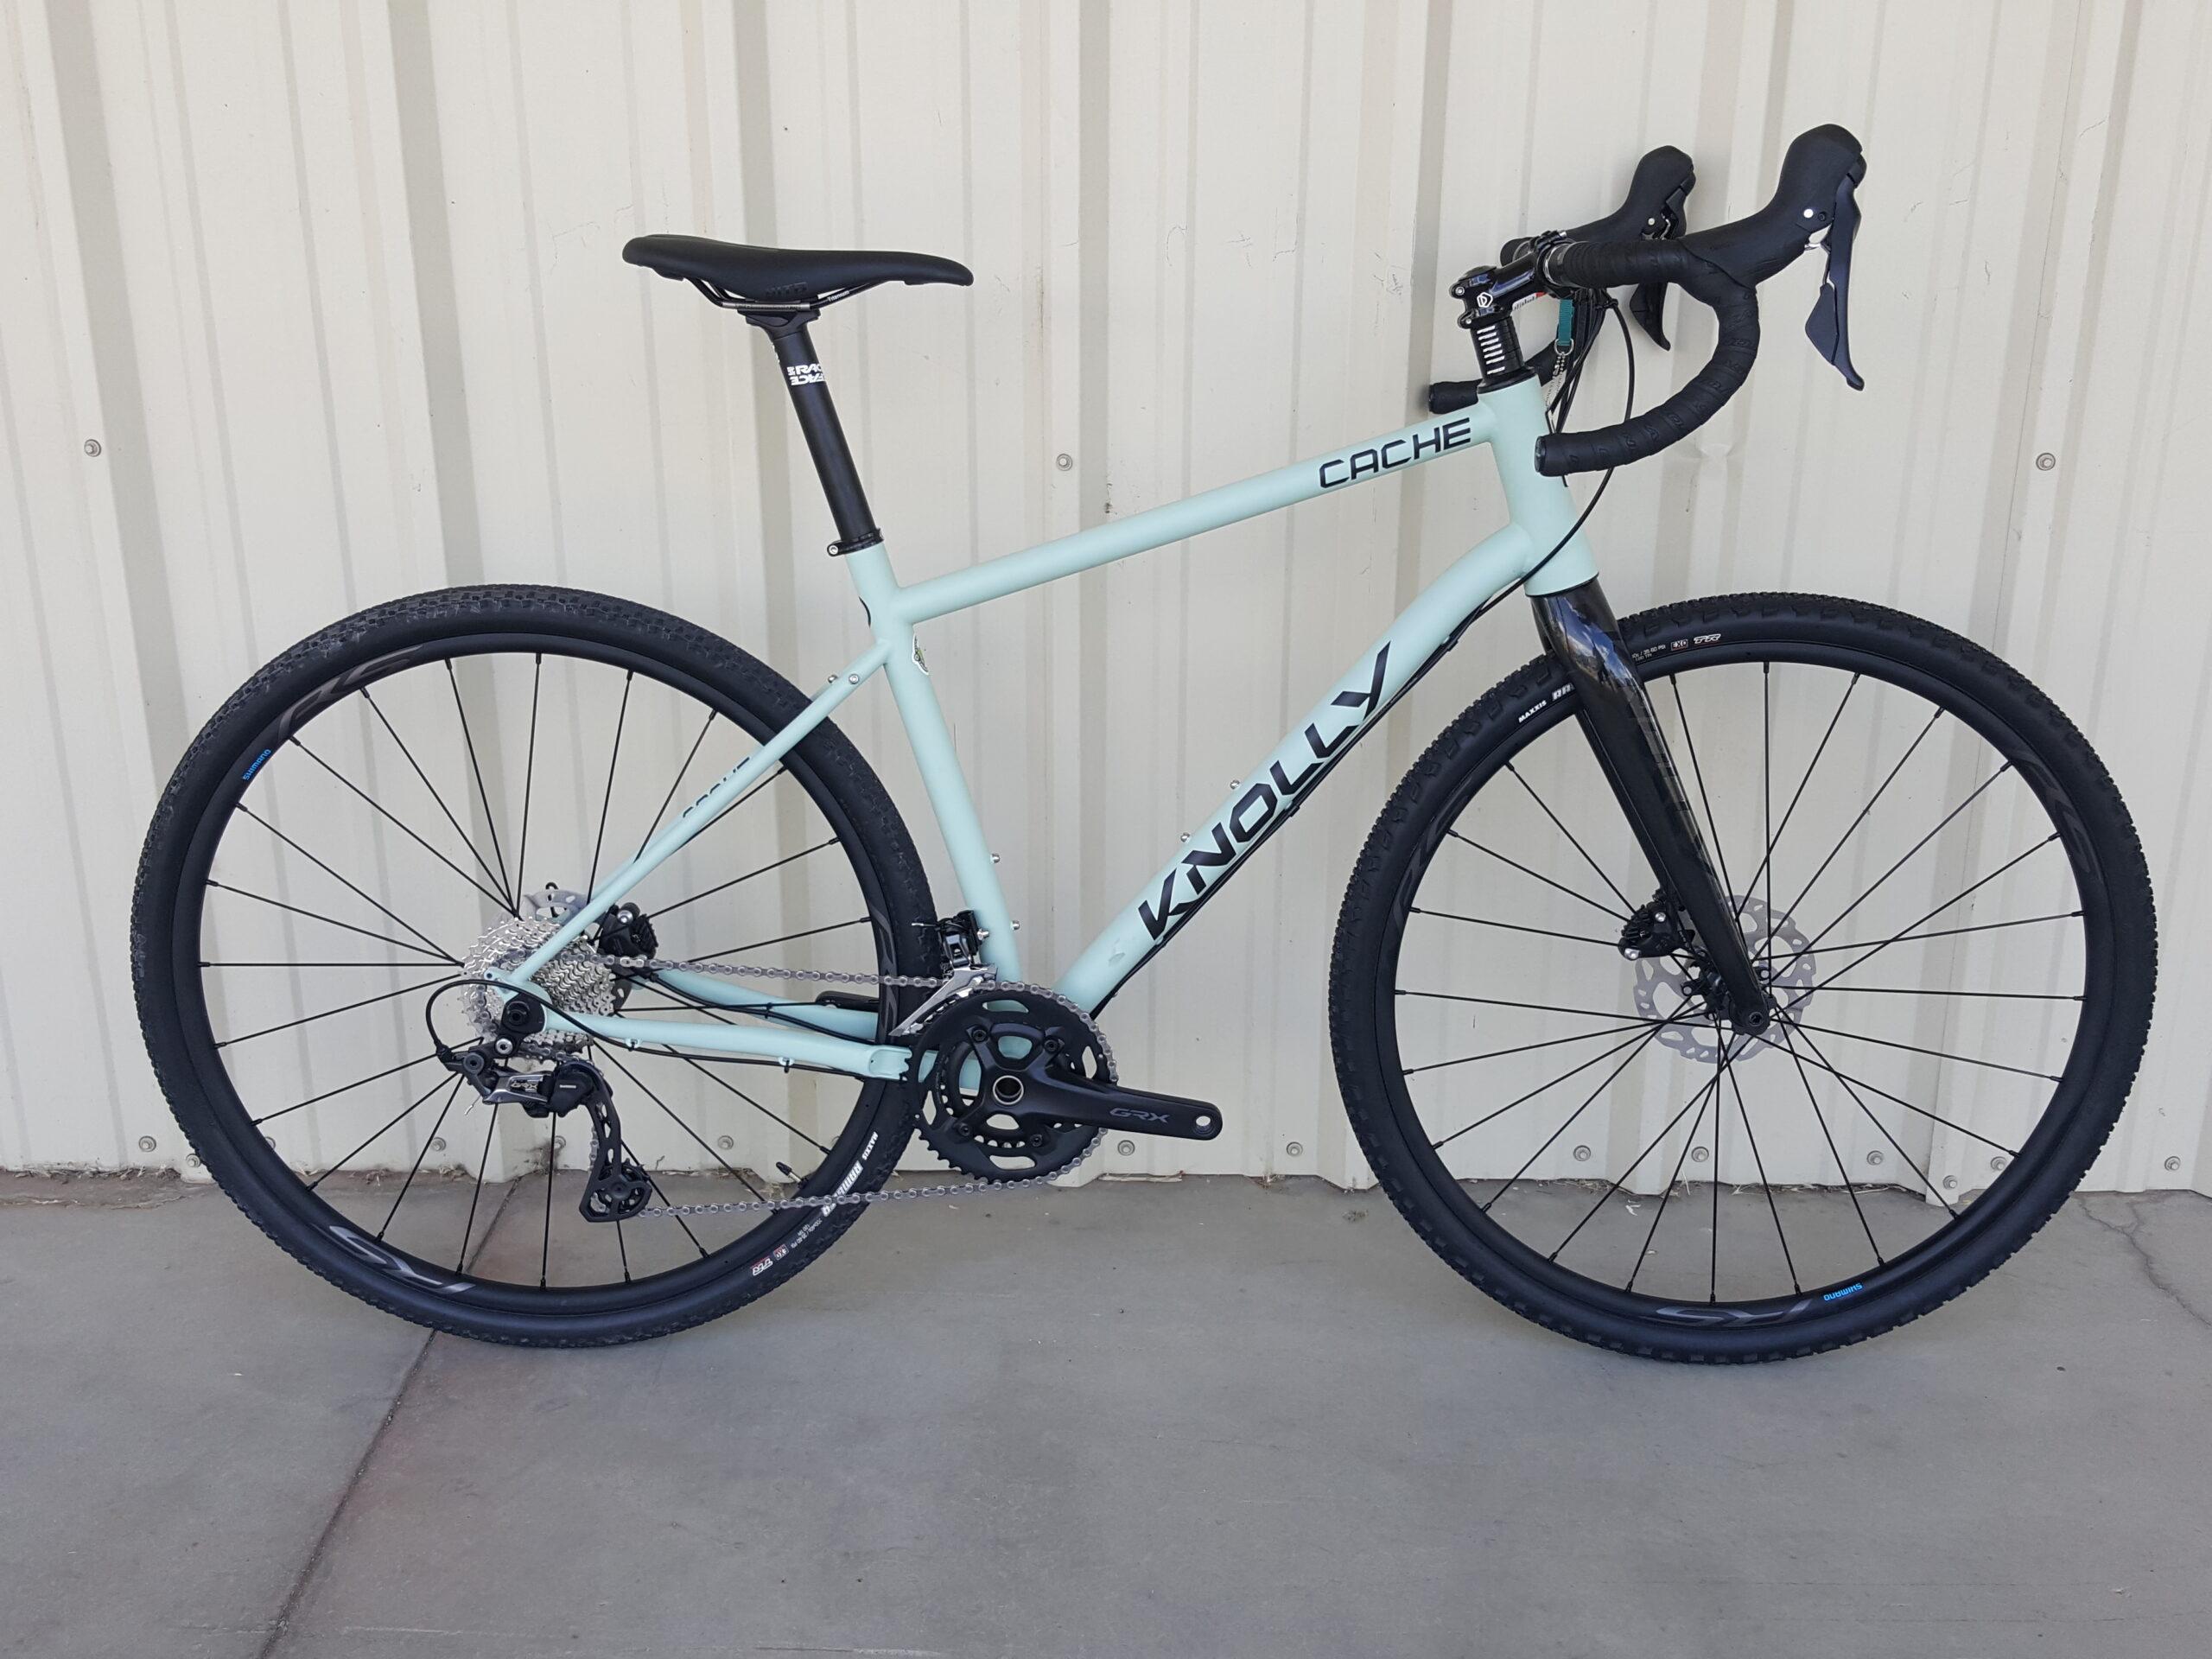 2021--Knolly Cache--Gravel Bike